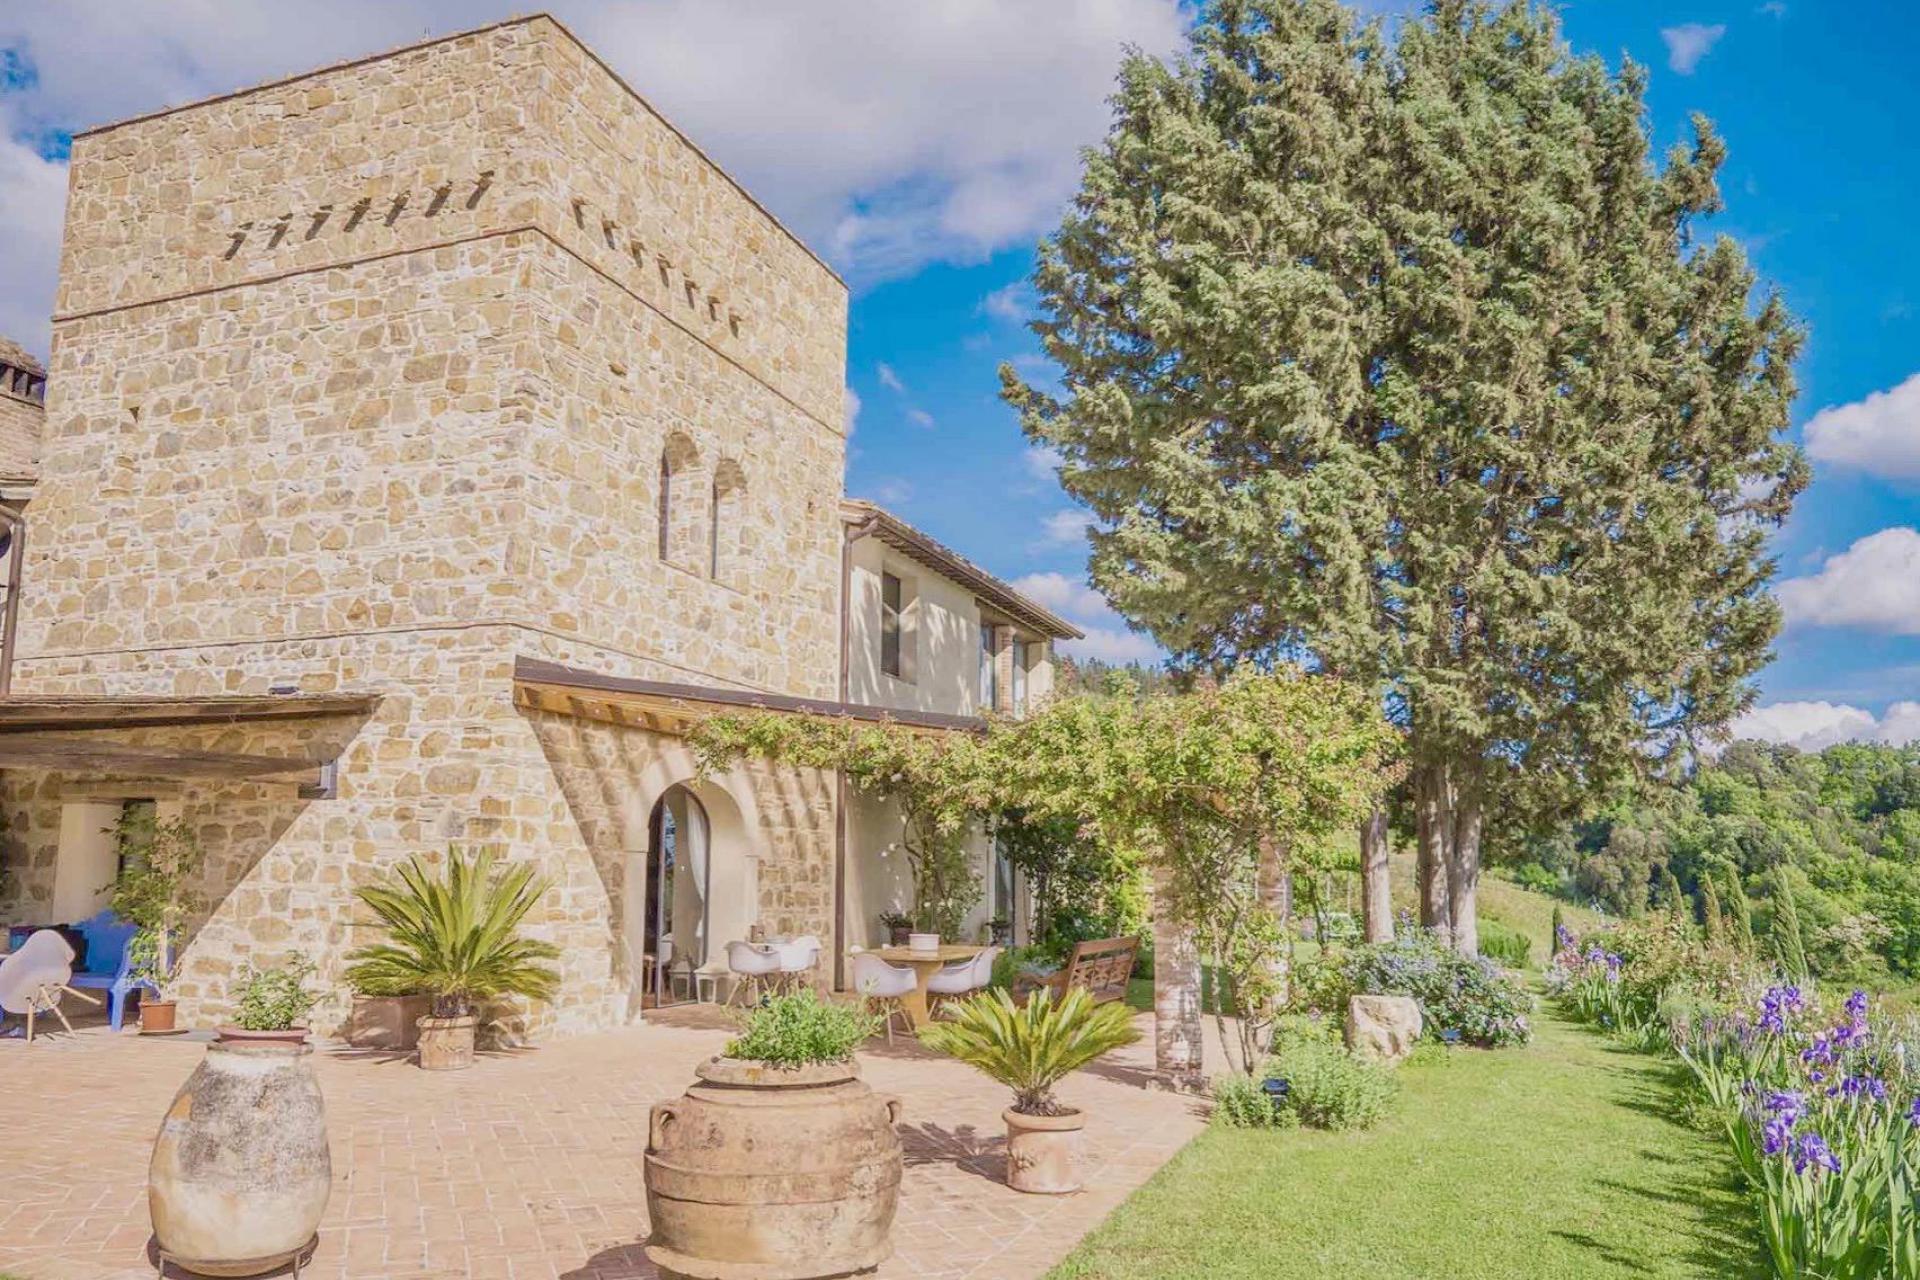 Agriturismo Toscane Agriturismo in olijfgaard met super uitzicht in Toscane   myitaly.nl